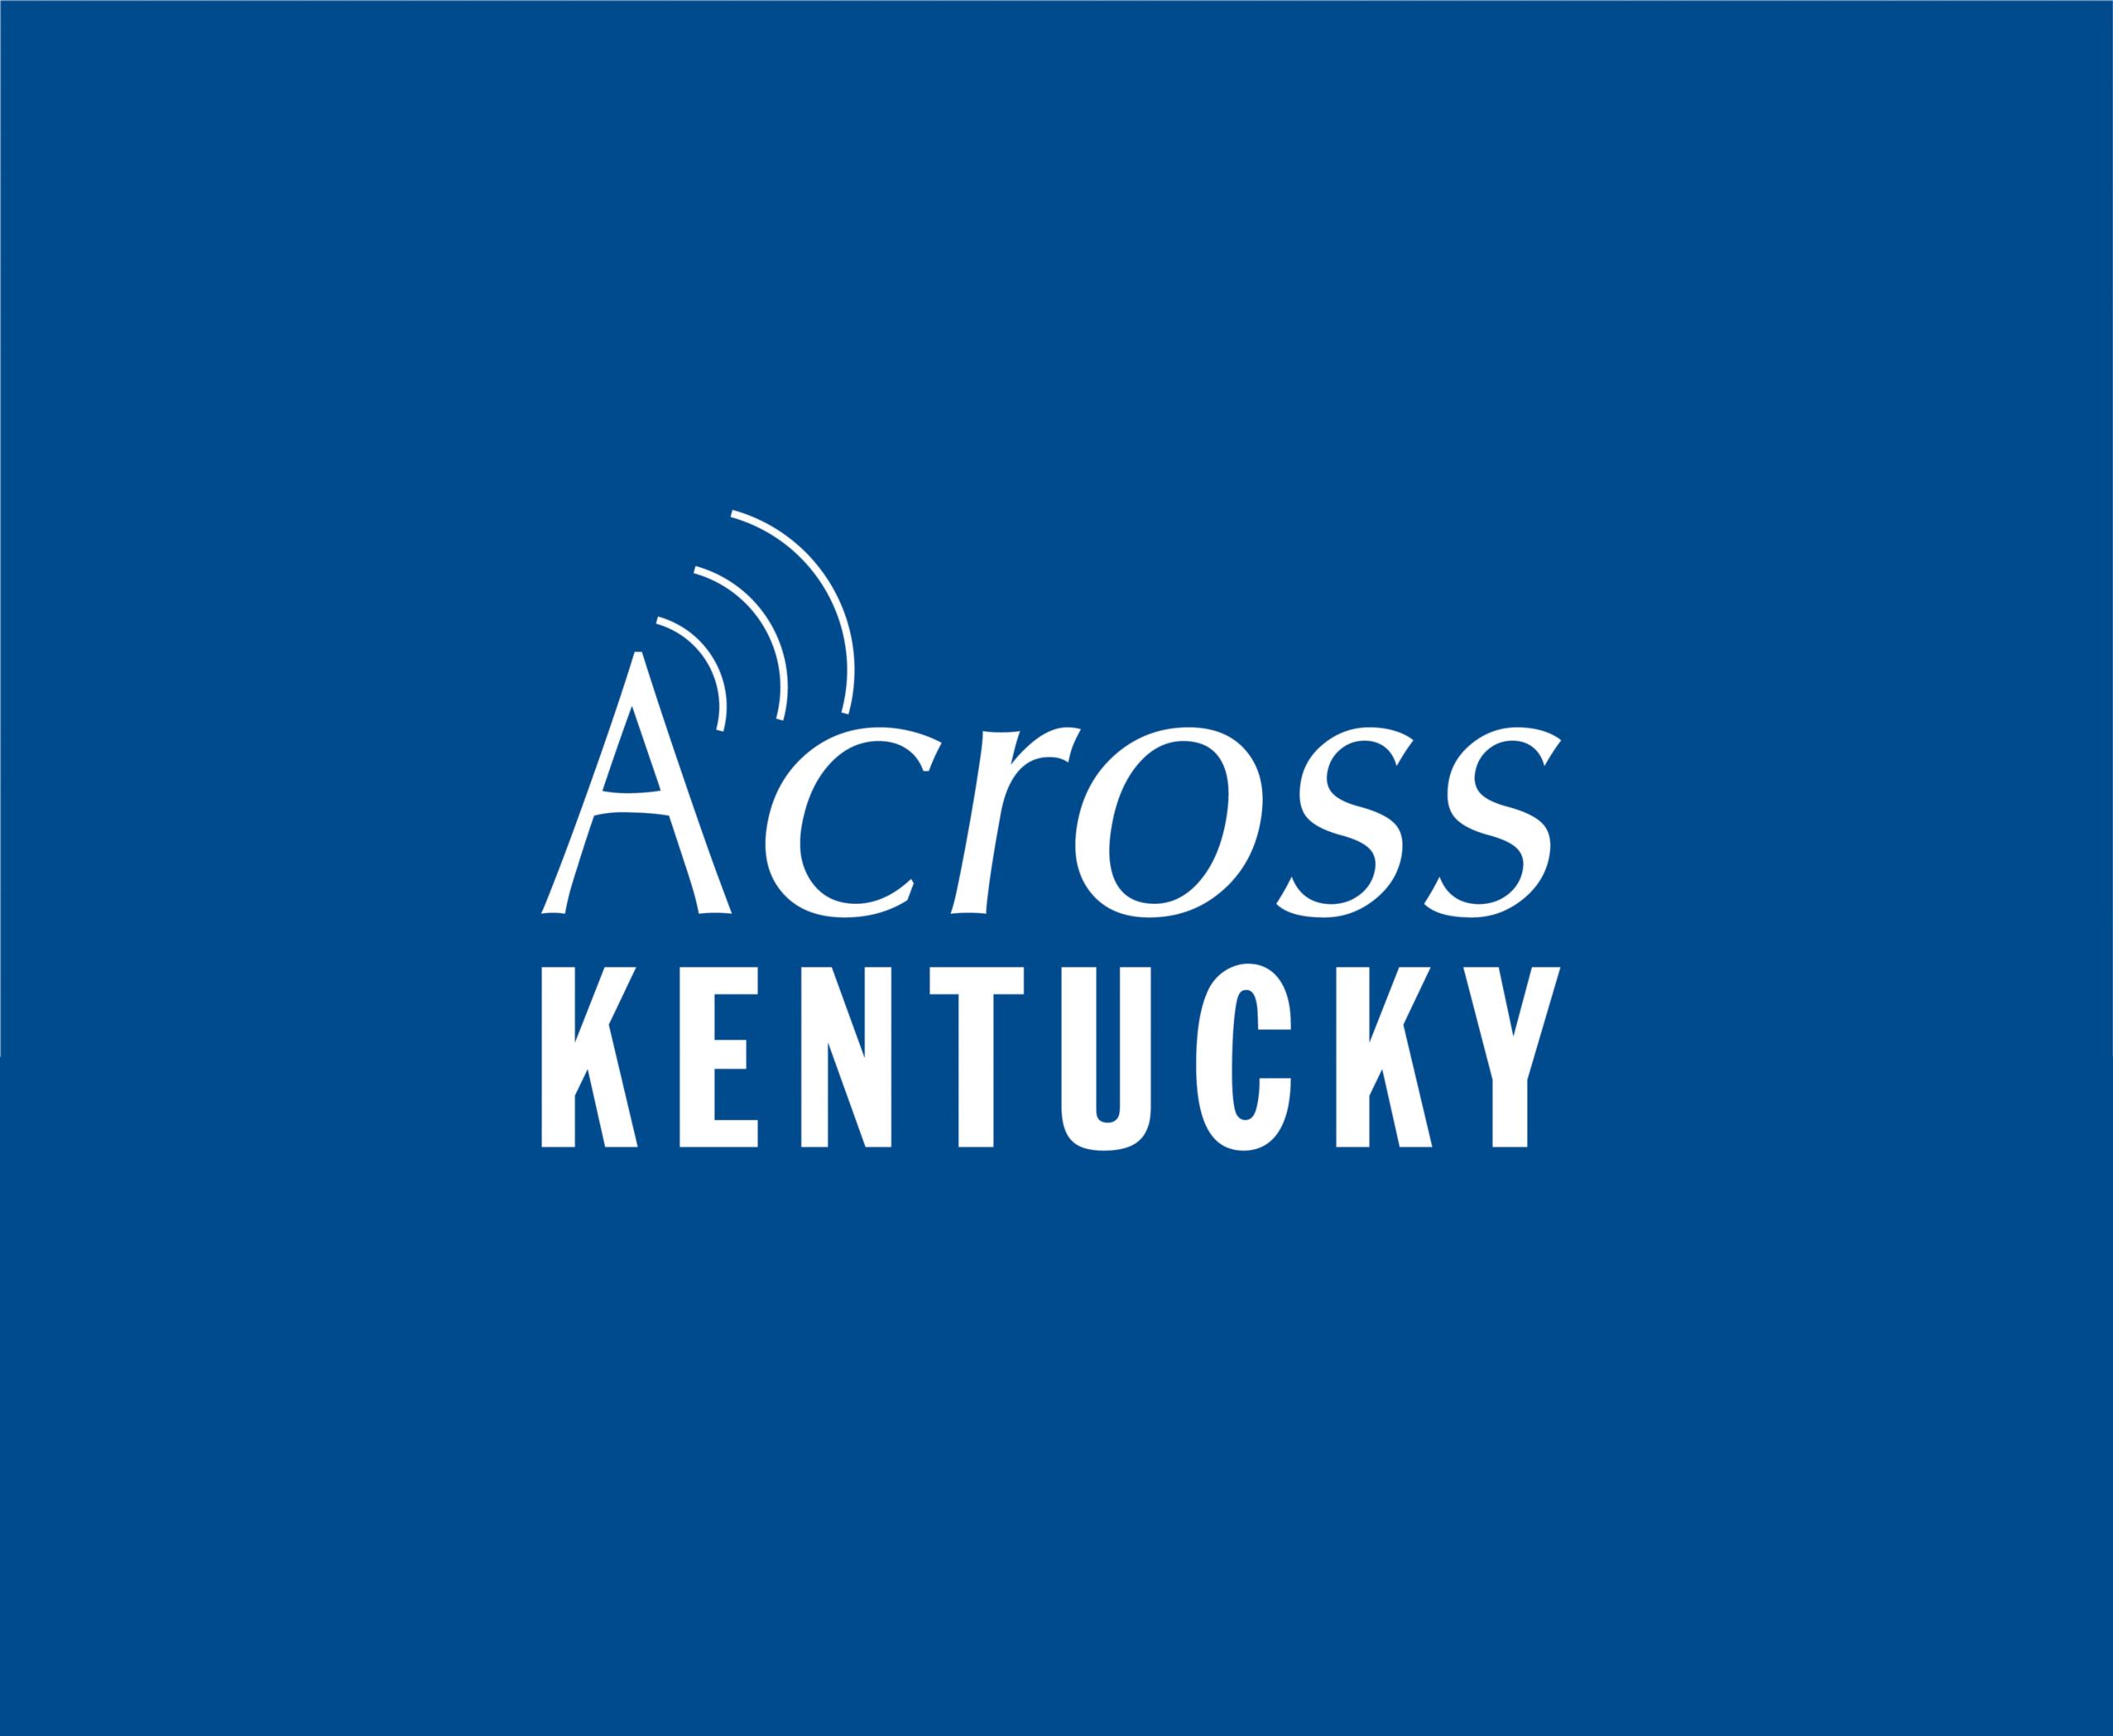 Johnson County Farmer Featured on Statewide Radio Program